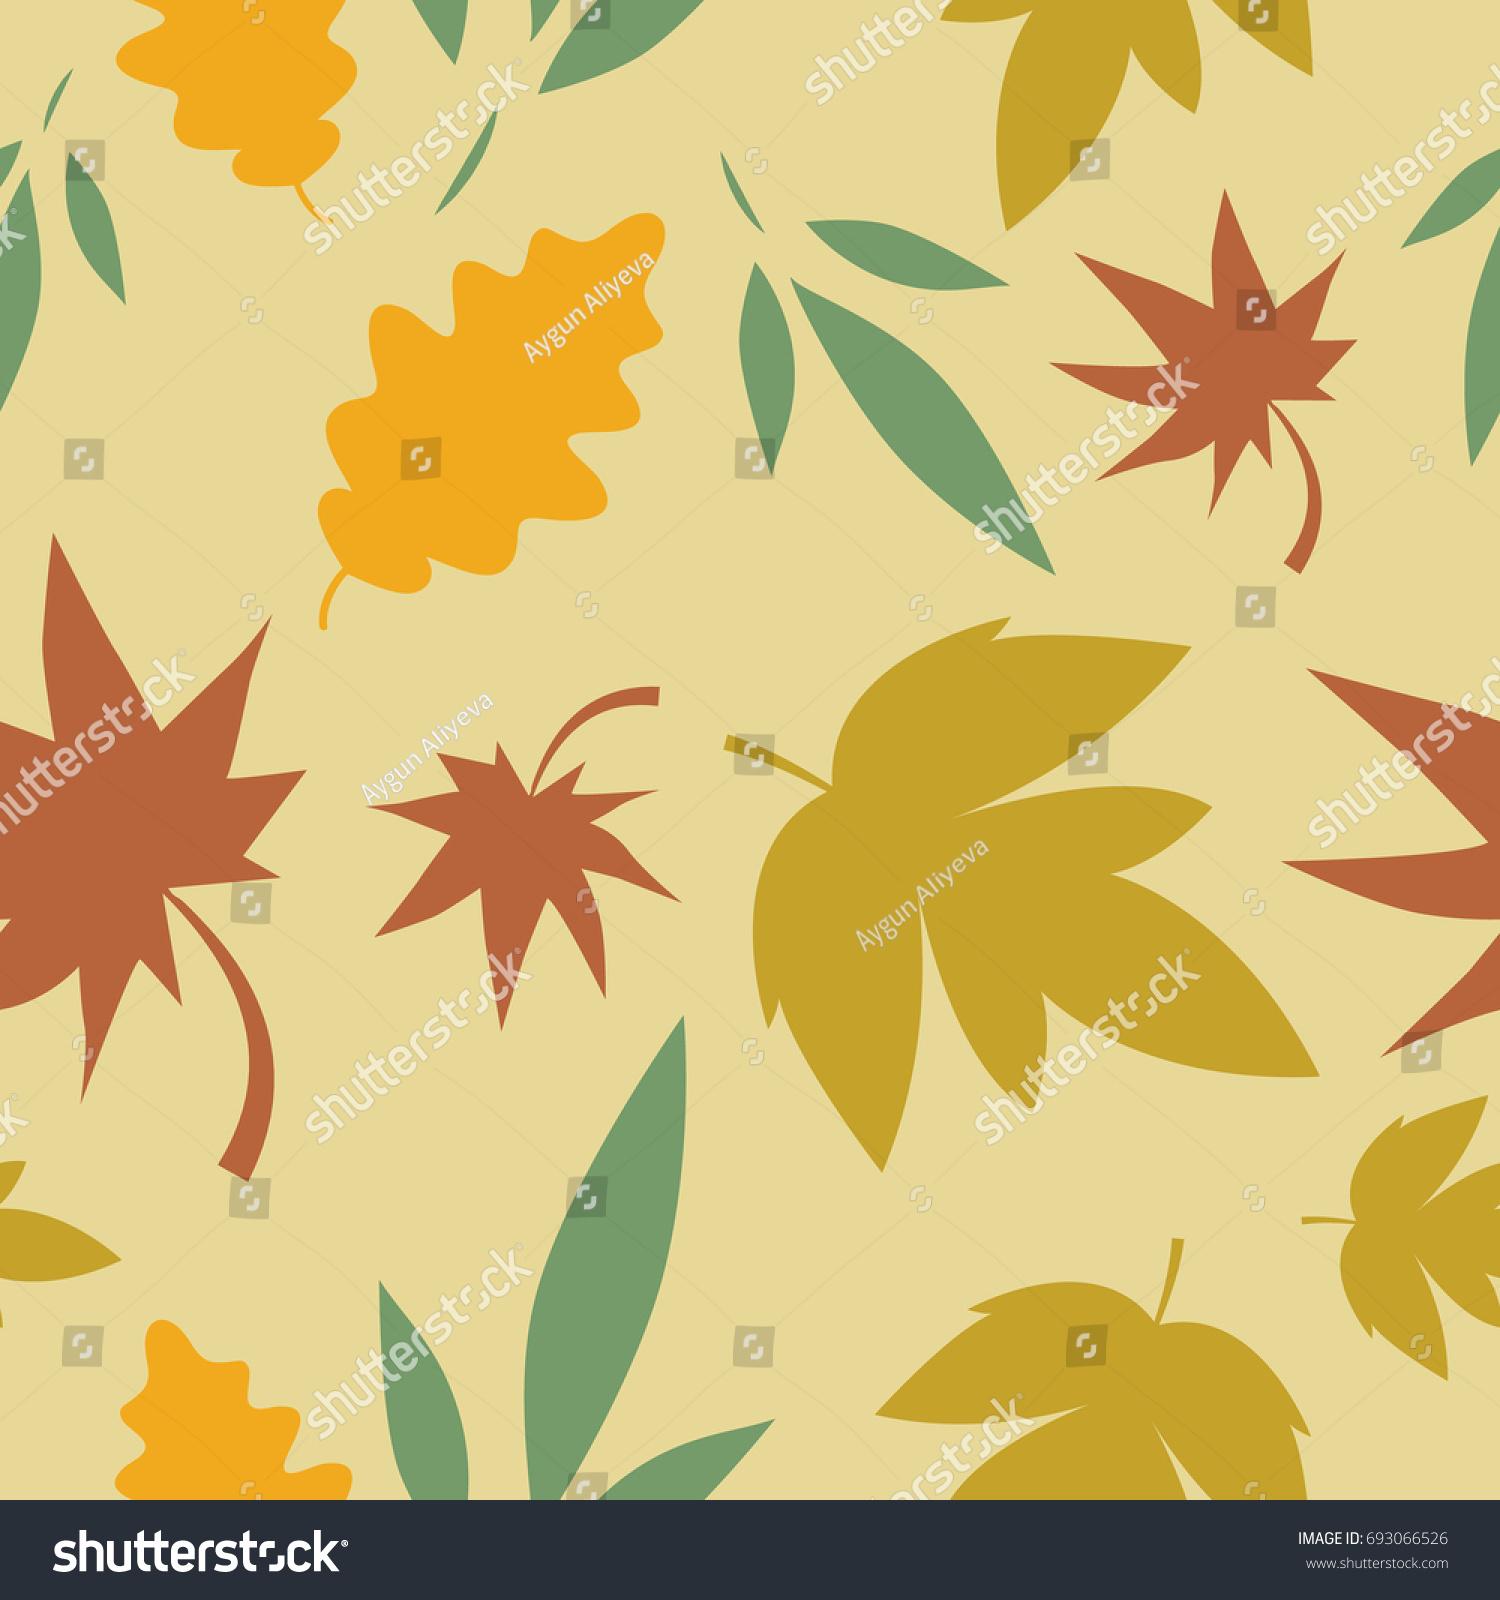 Autumn Seamless Pattern Leaf Autumn Leaf Stock Vector Royalty Free 693066526